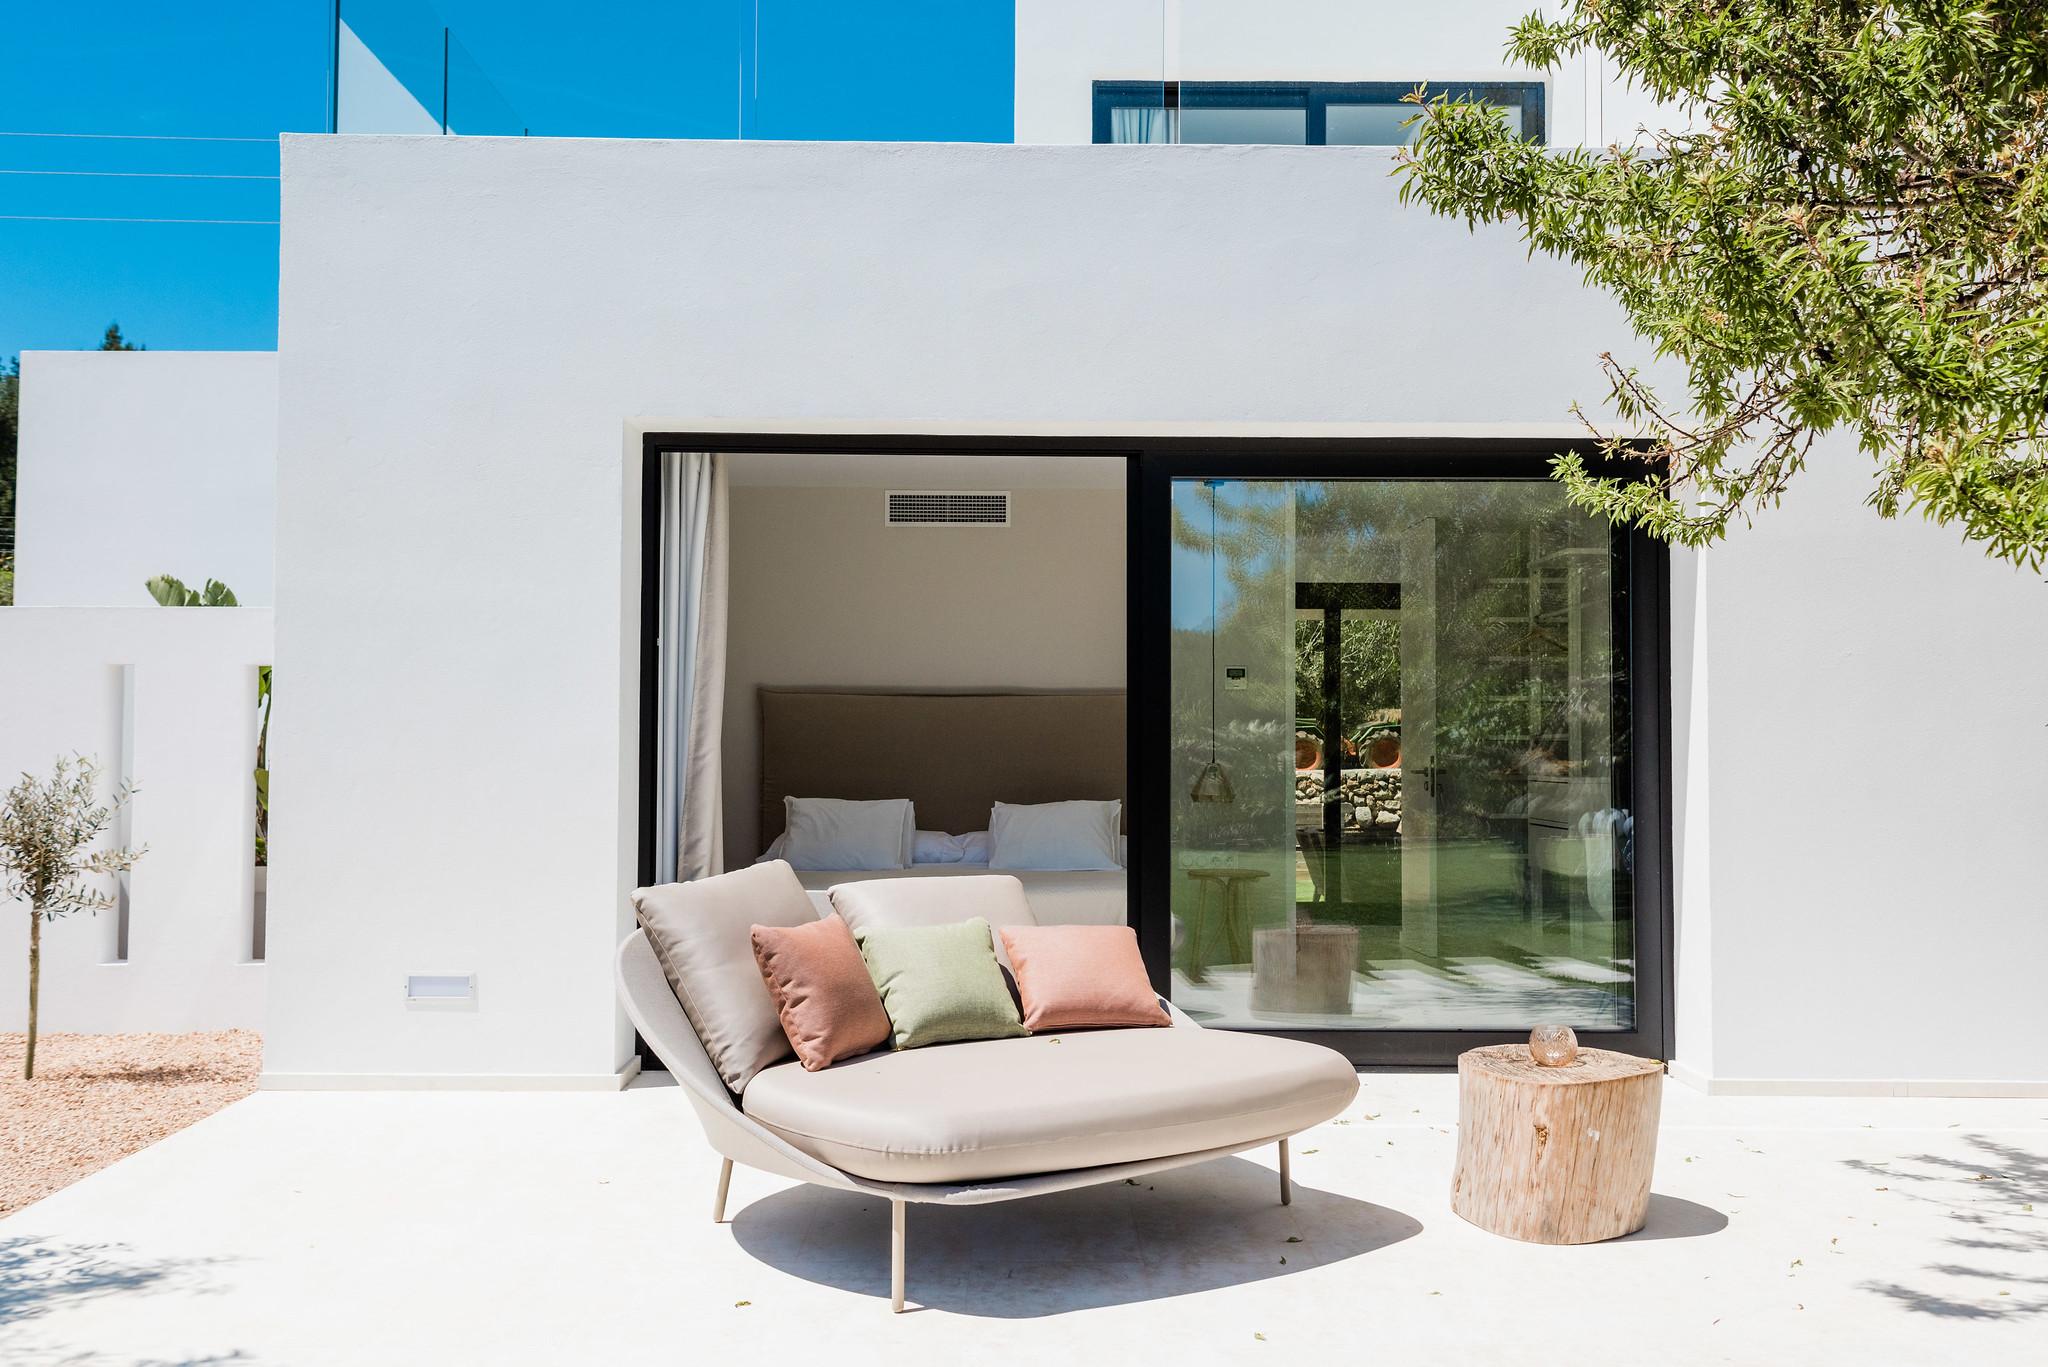 https://www.white-ibiza.com/wp-content/uploads/2020/06/white-ibiza-villas-can-carmen-exterior-seating.jpg